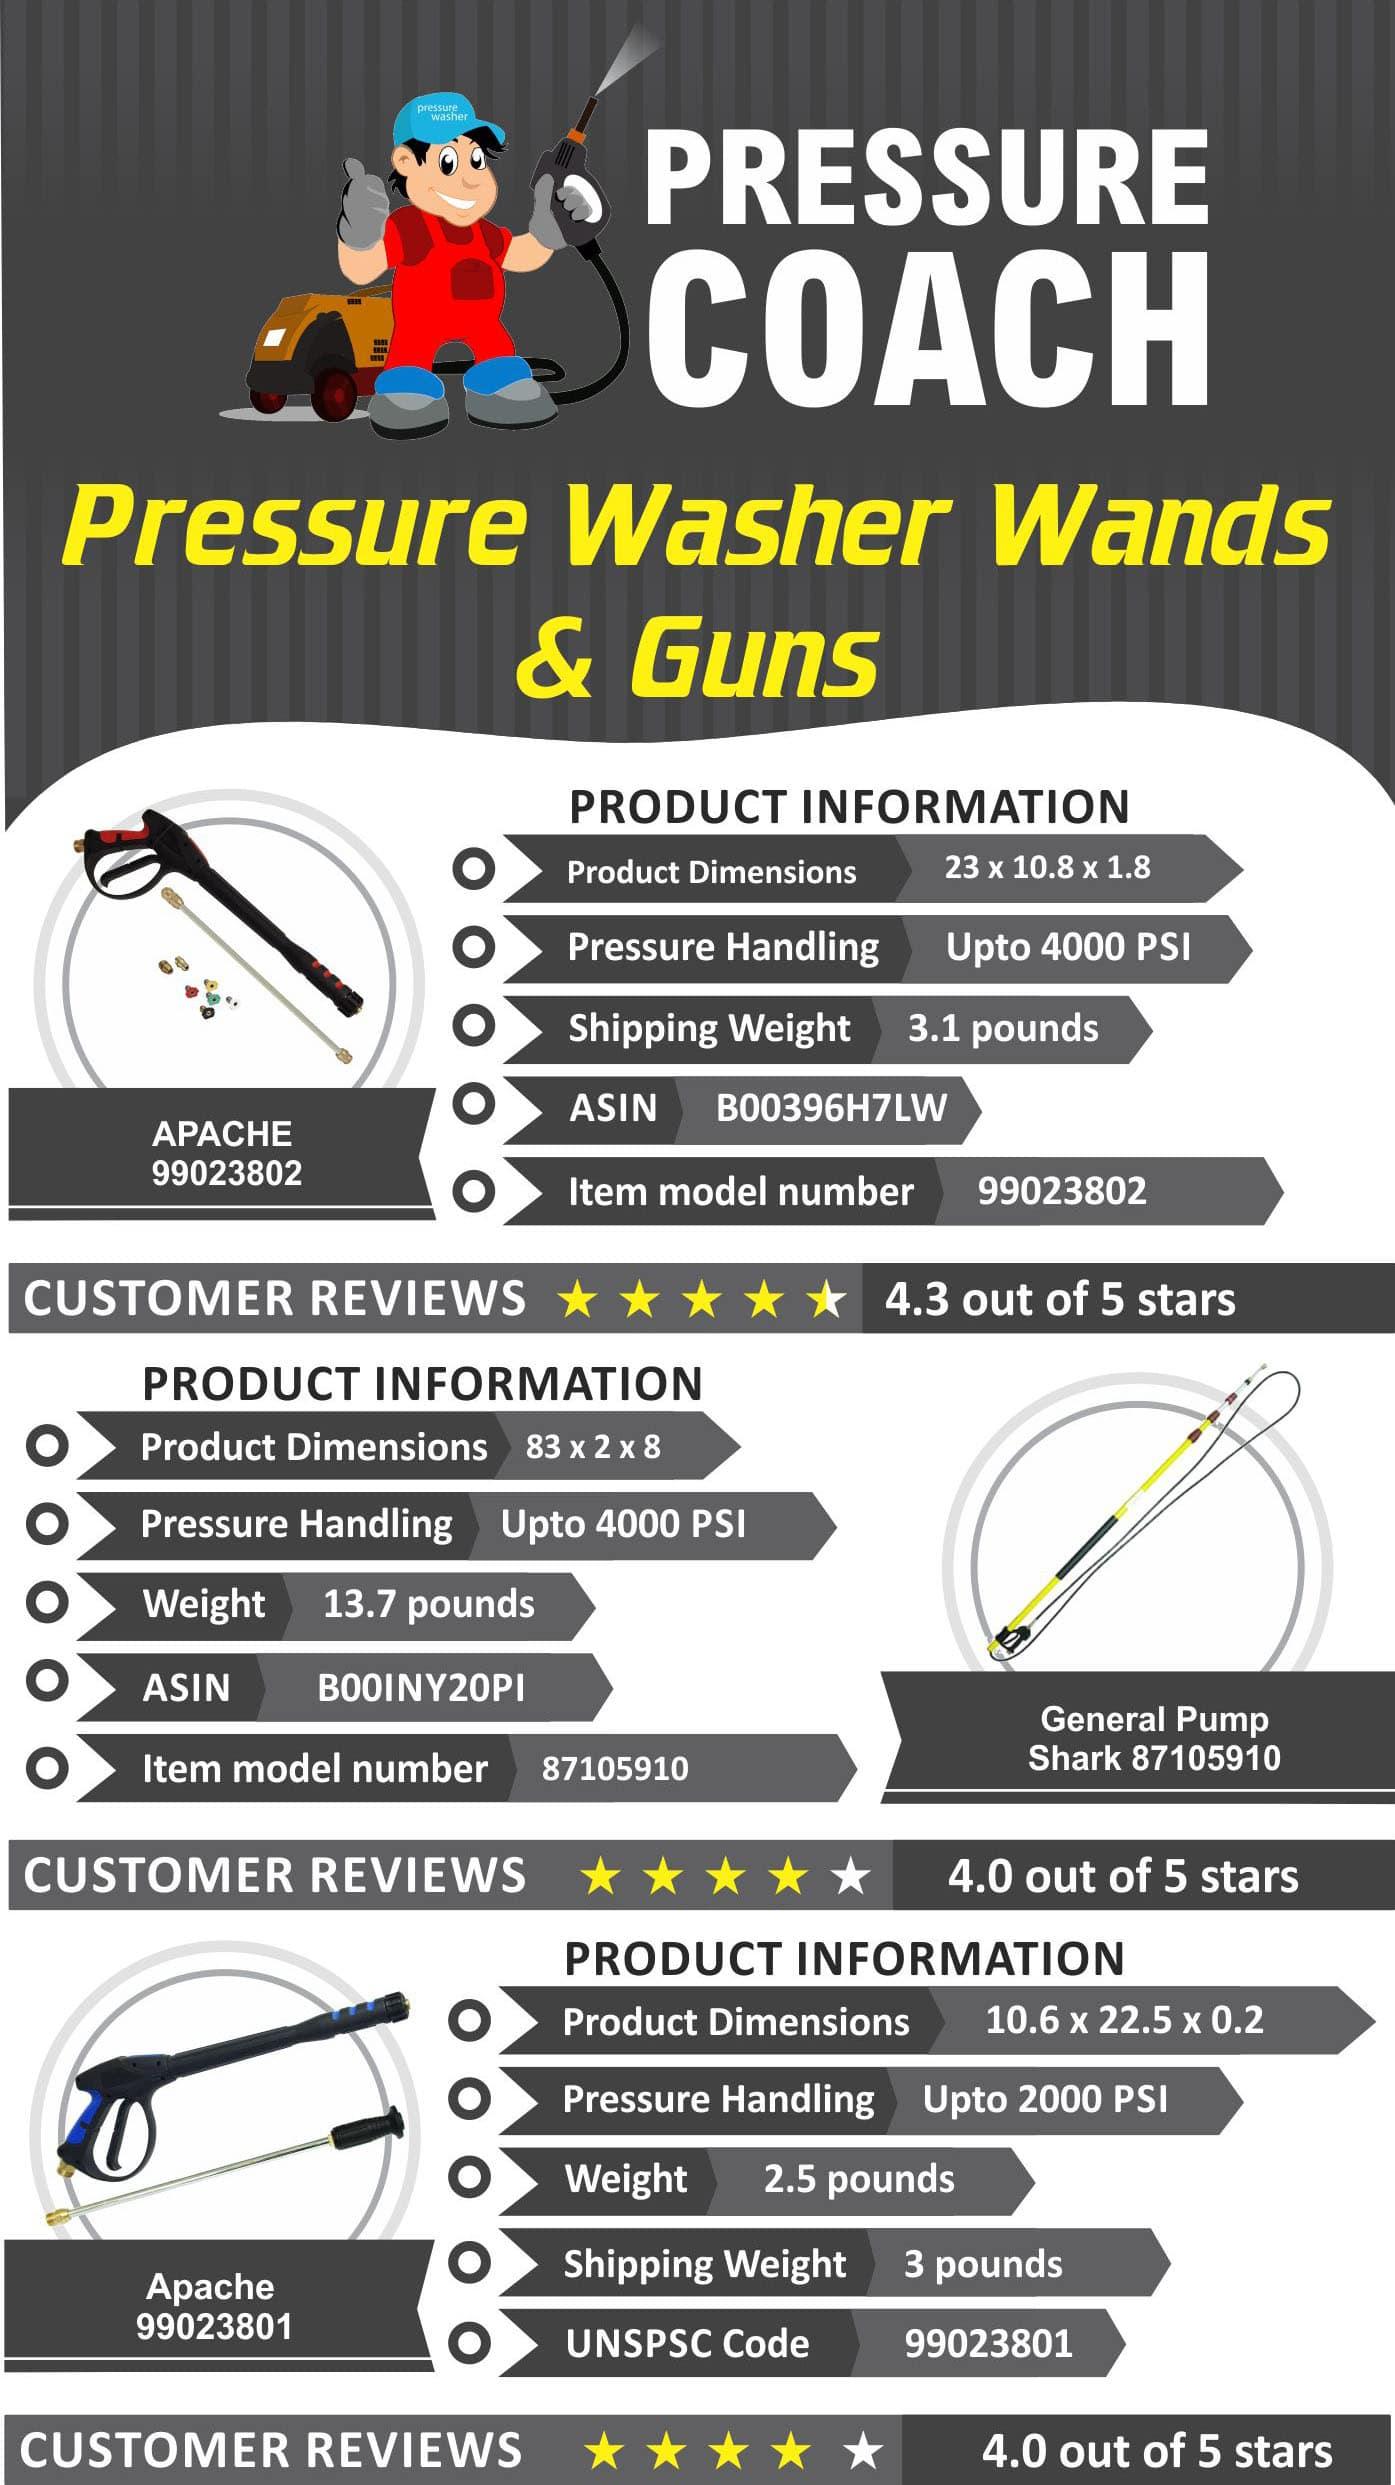 Top Pressure Washer Wands & Guns